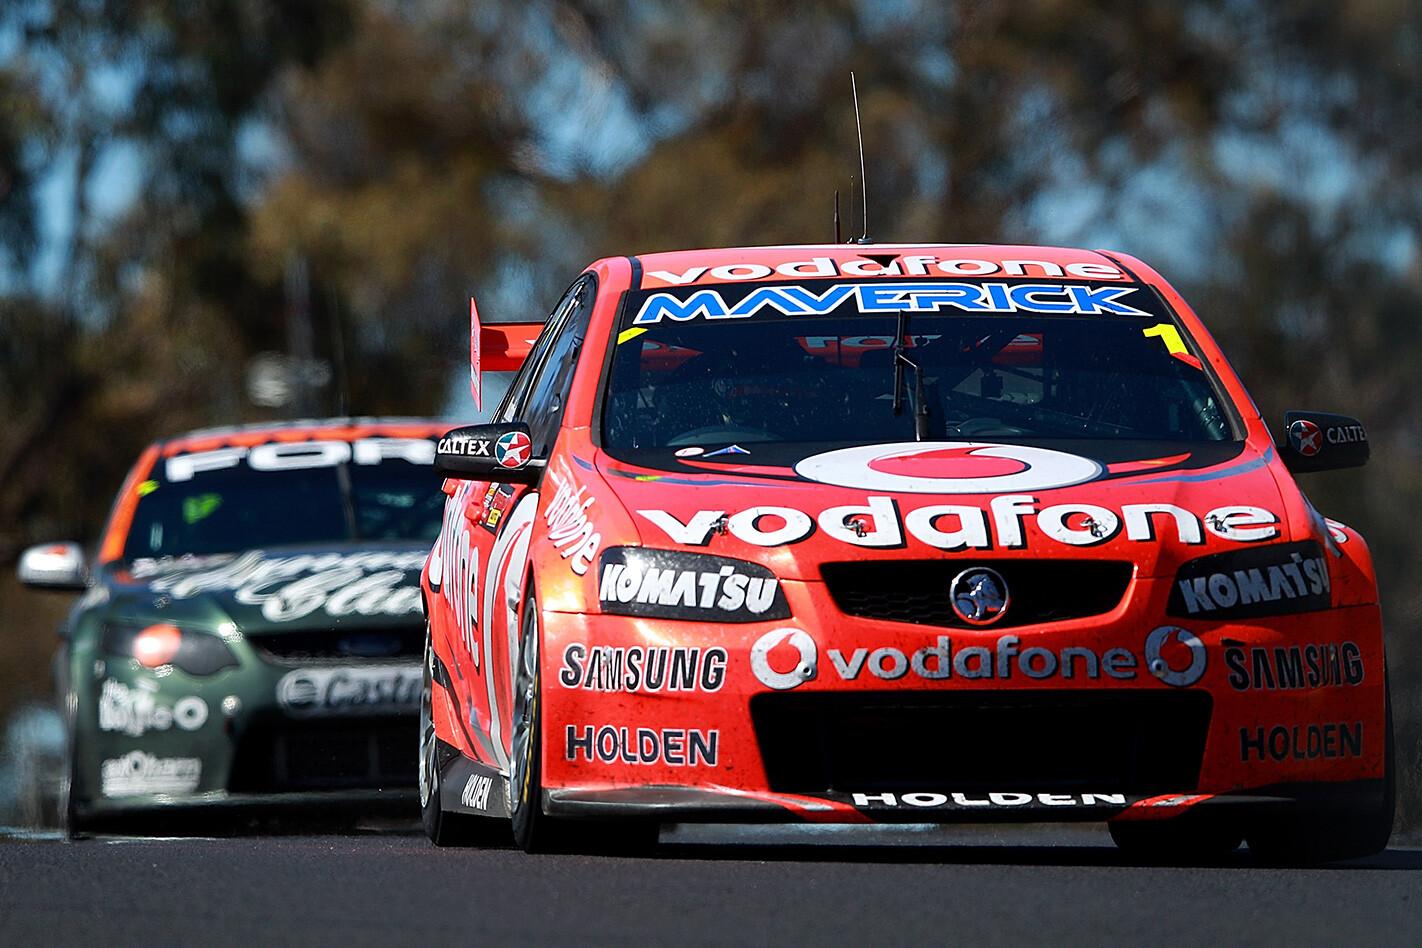 Holden Motorsport 8 Jpg